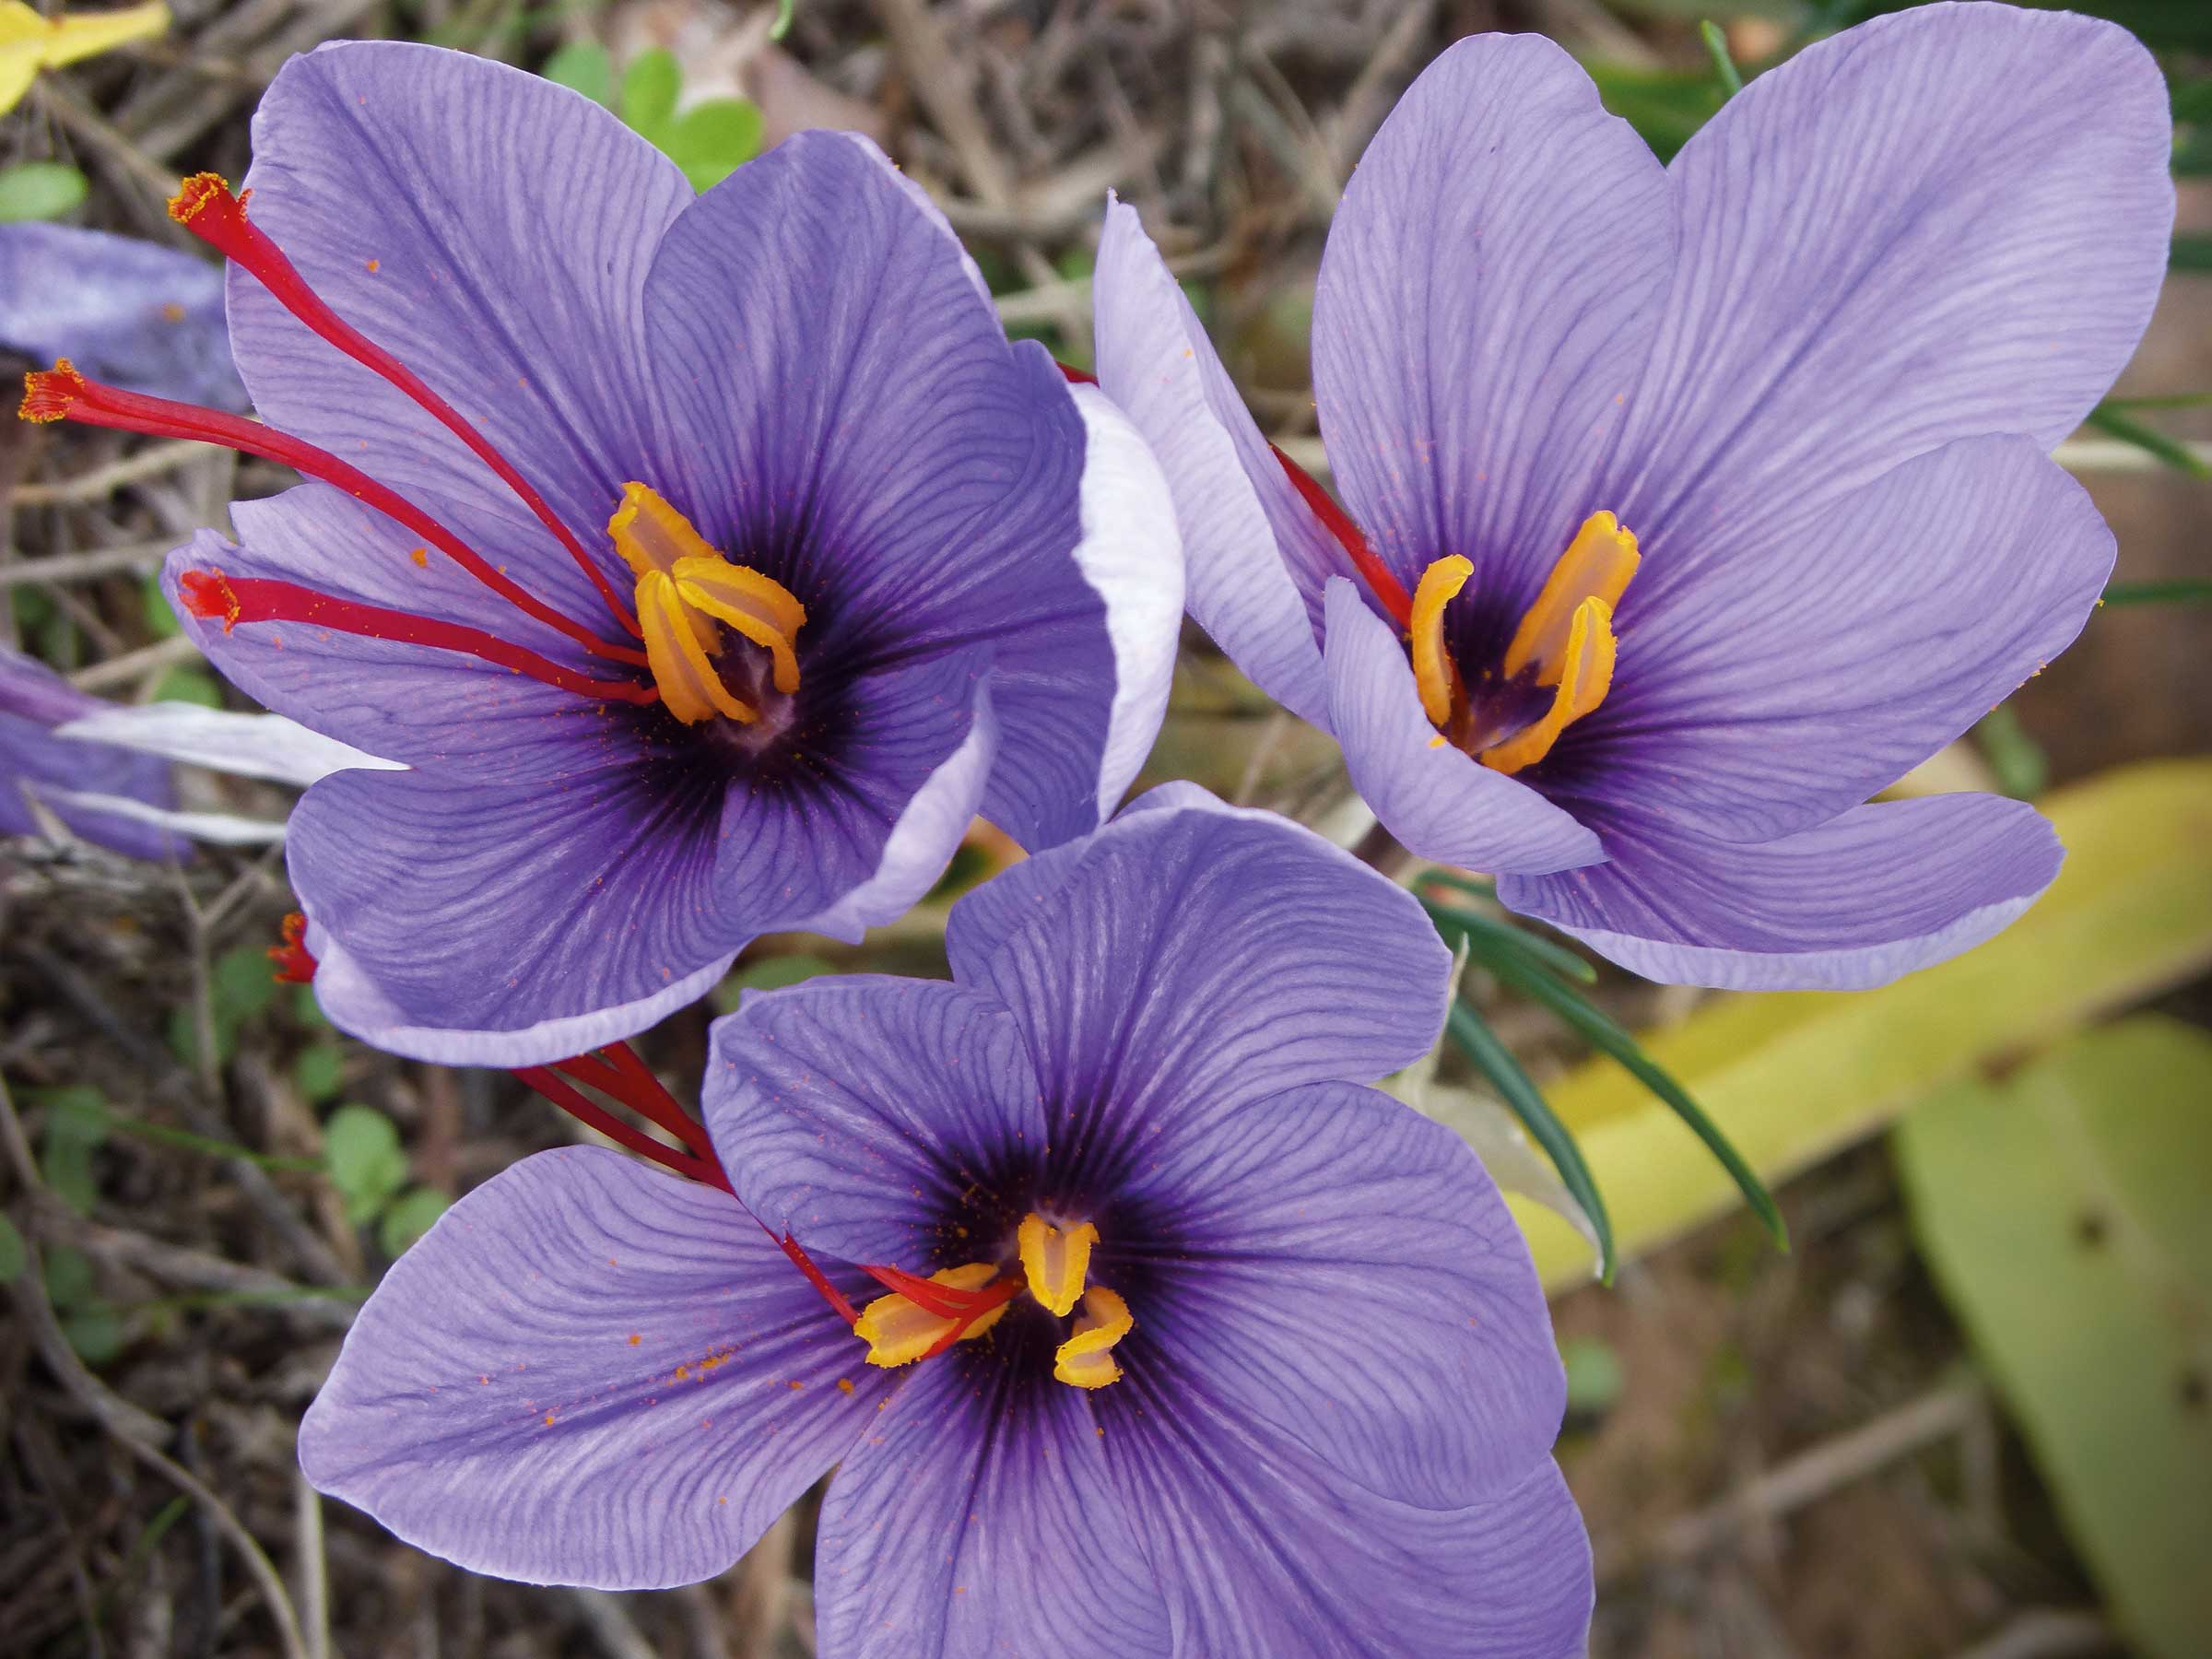 safran krokusblüte